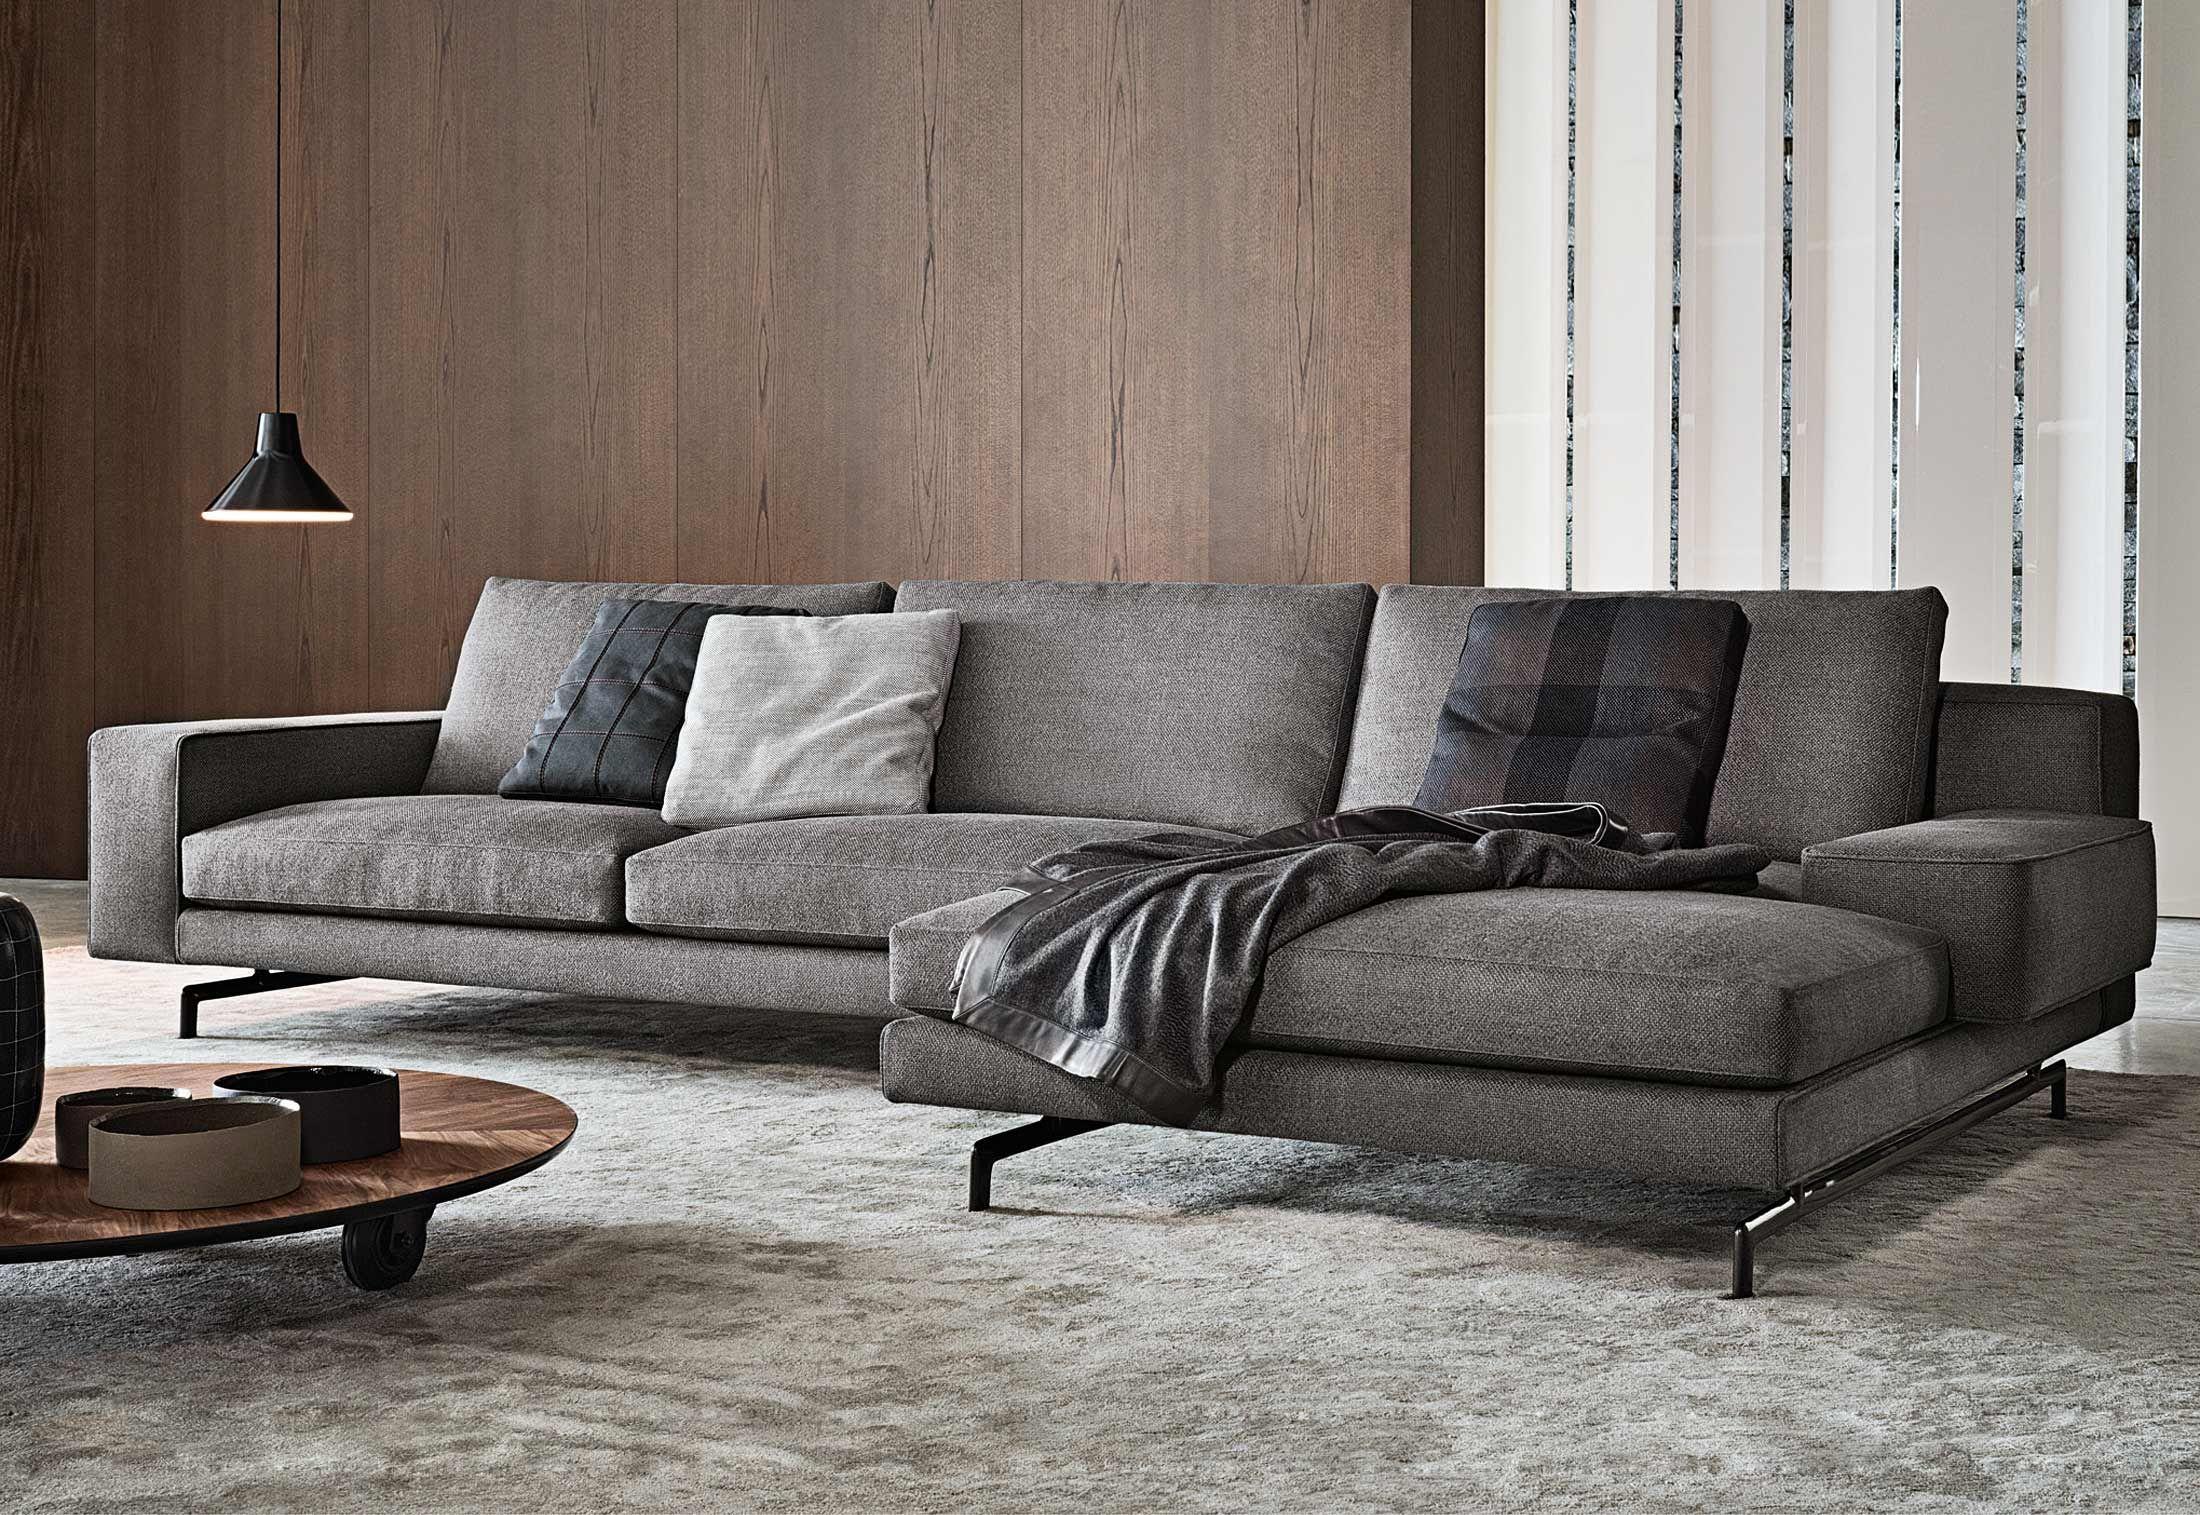 Minotti sherman sofa final in 2018 pinterest d co salon mobilier de salon and salon - Meubles minotti ...